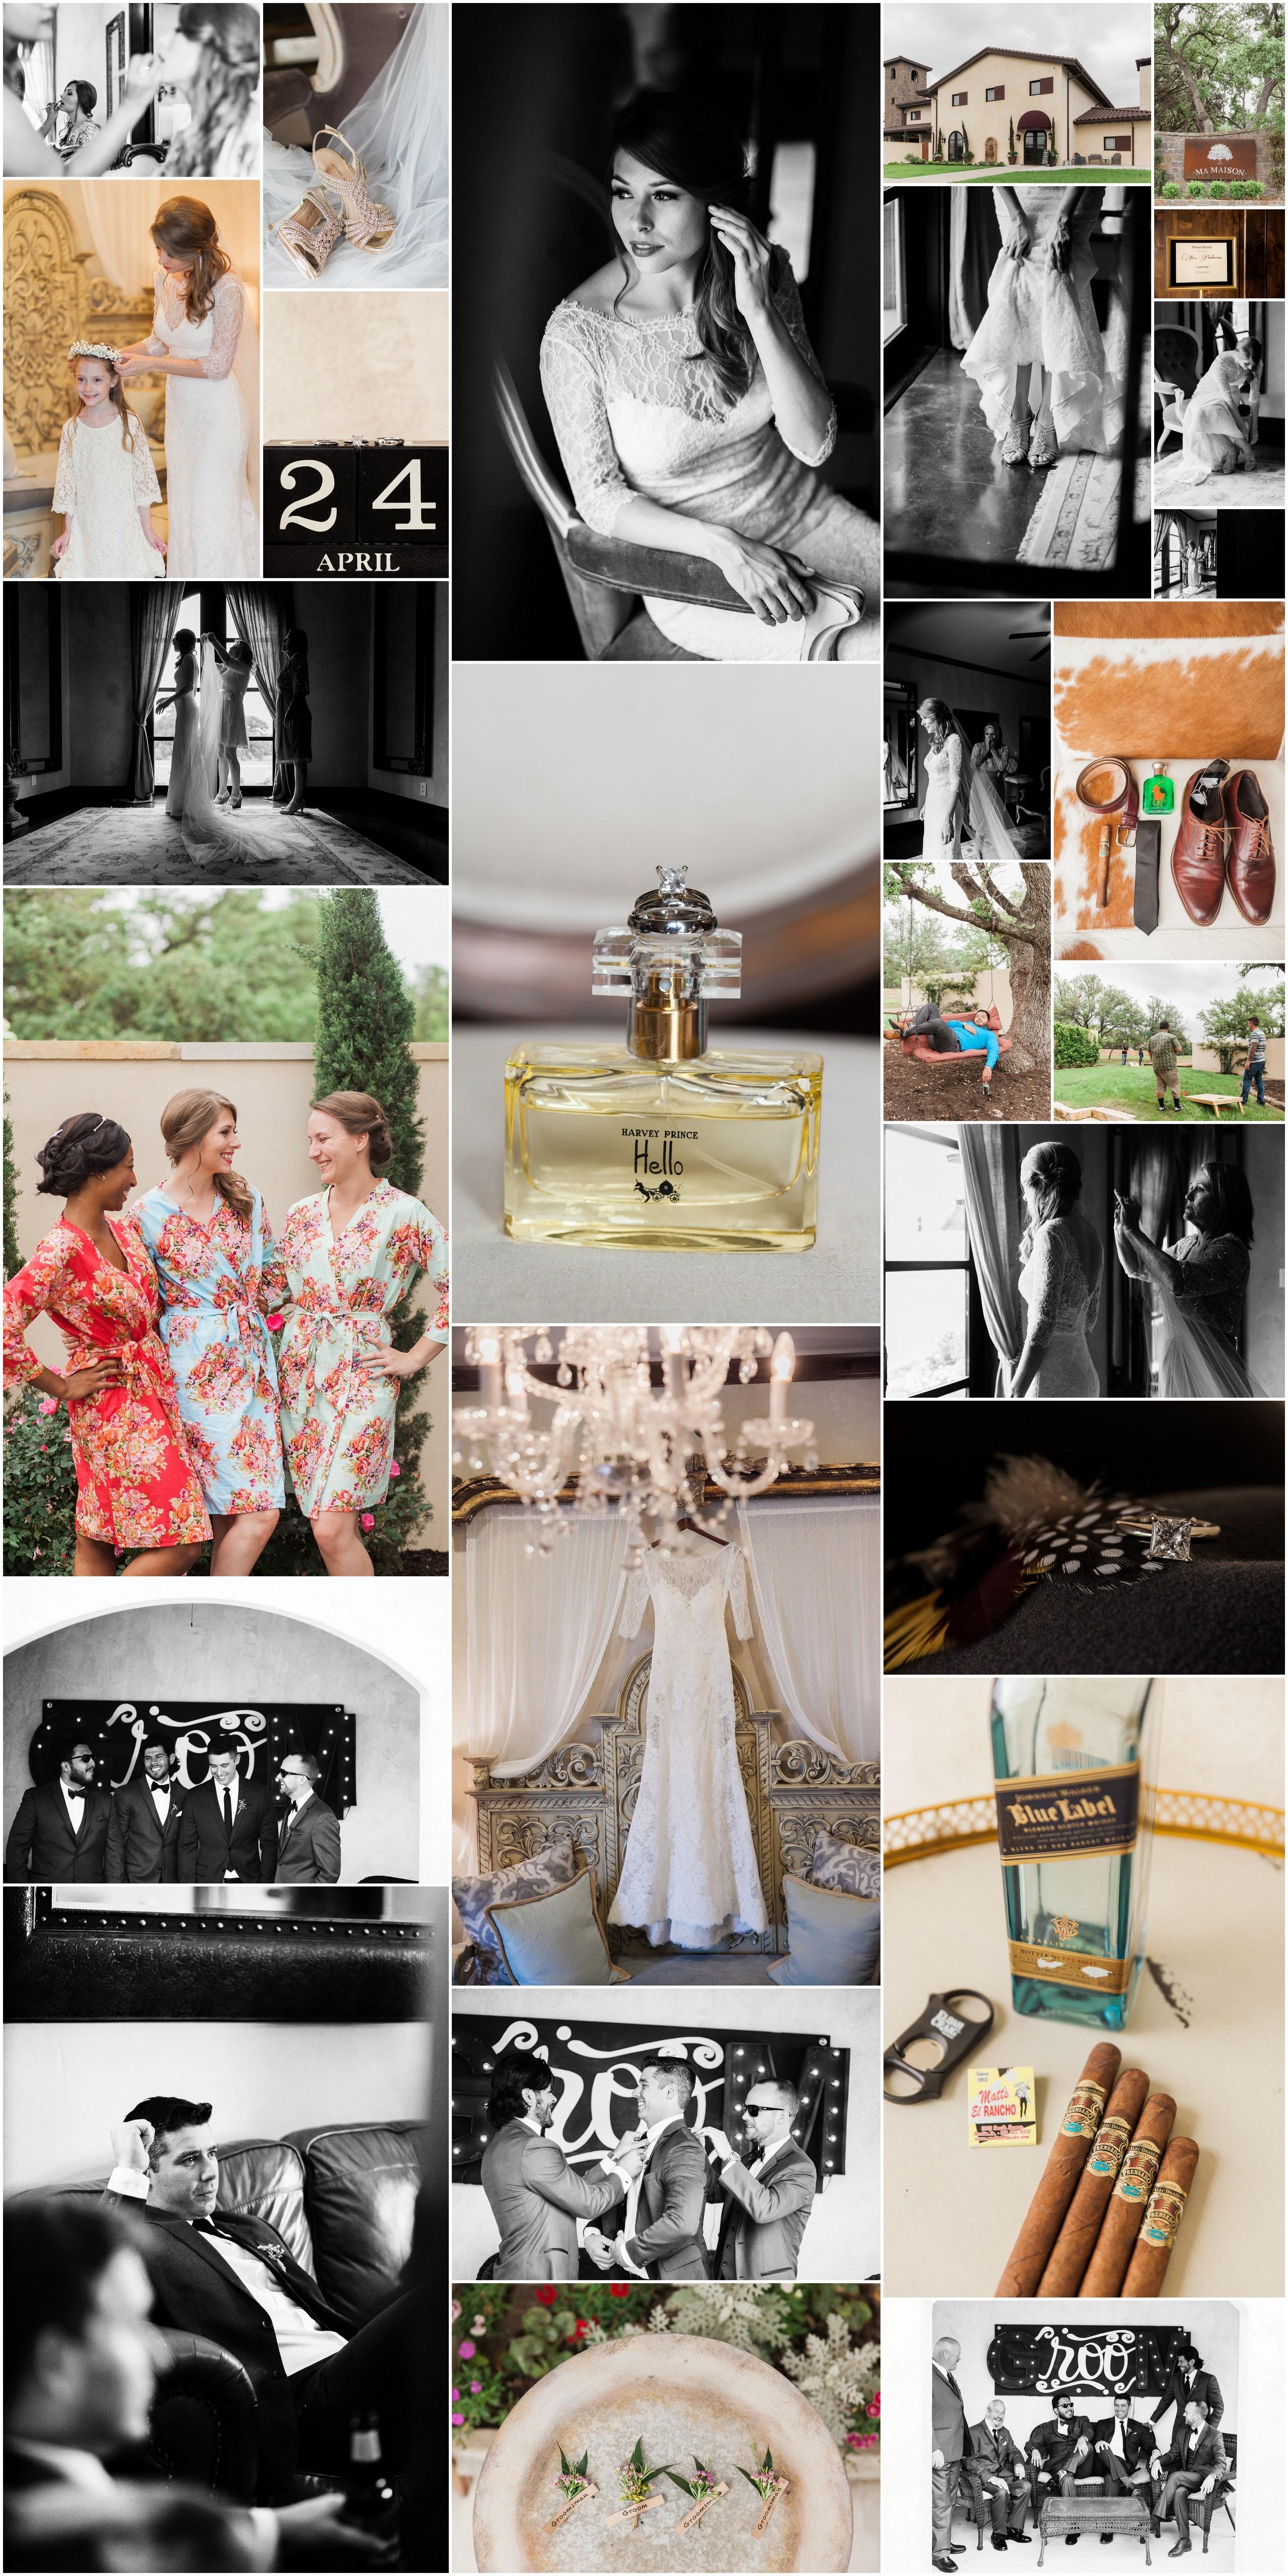 The Ma Maison Wedding